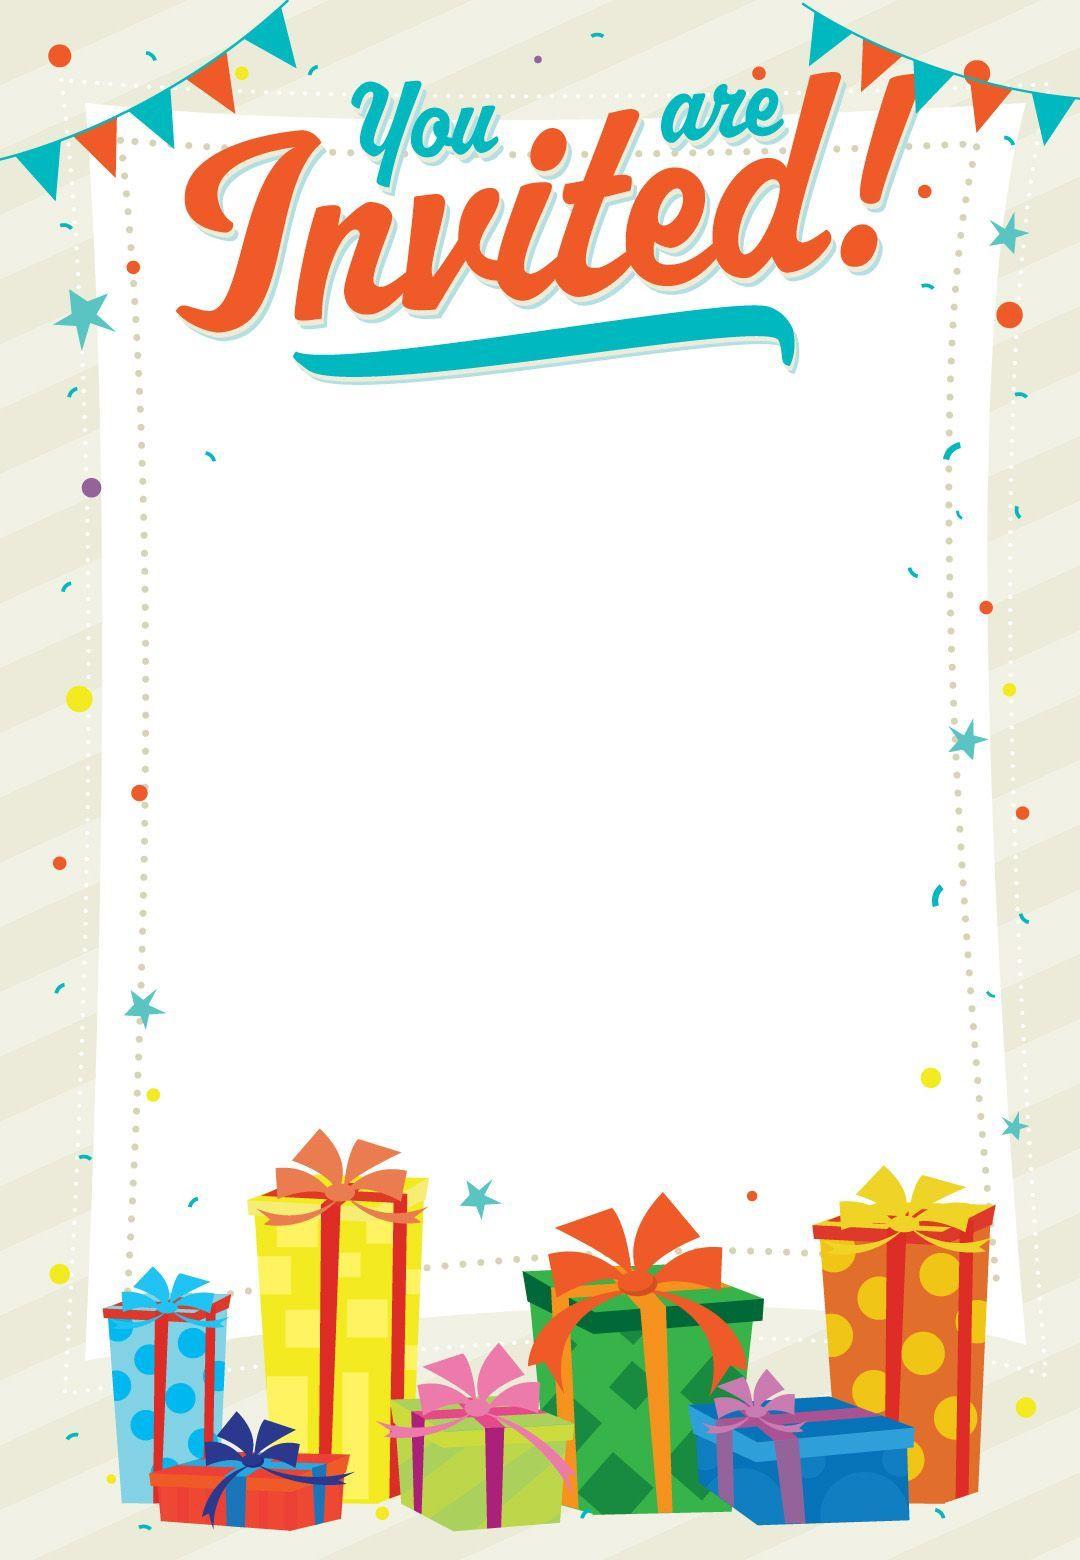 004 Singular Free Birthday Card Invitation Template Printable Picture Full